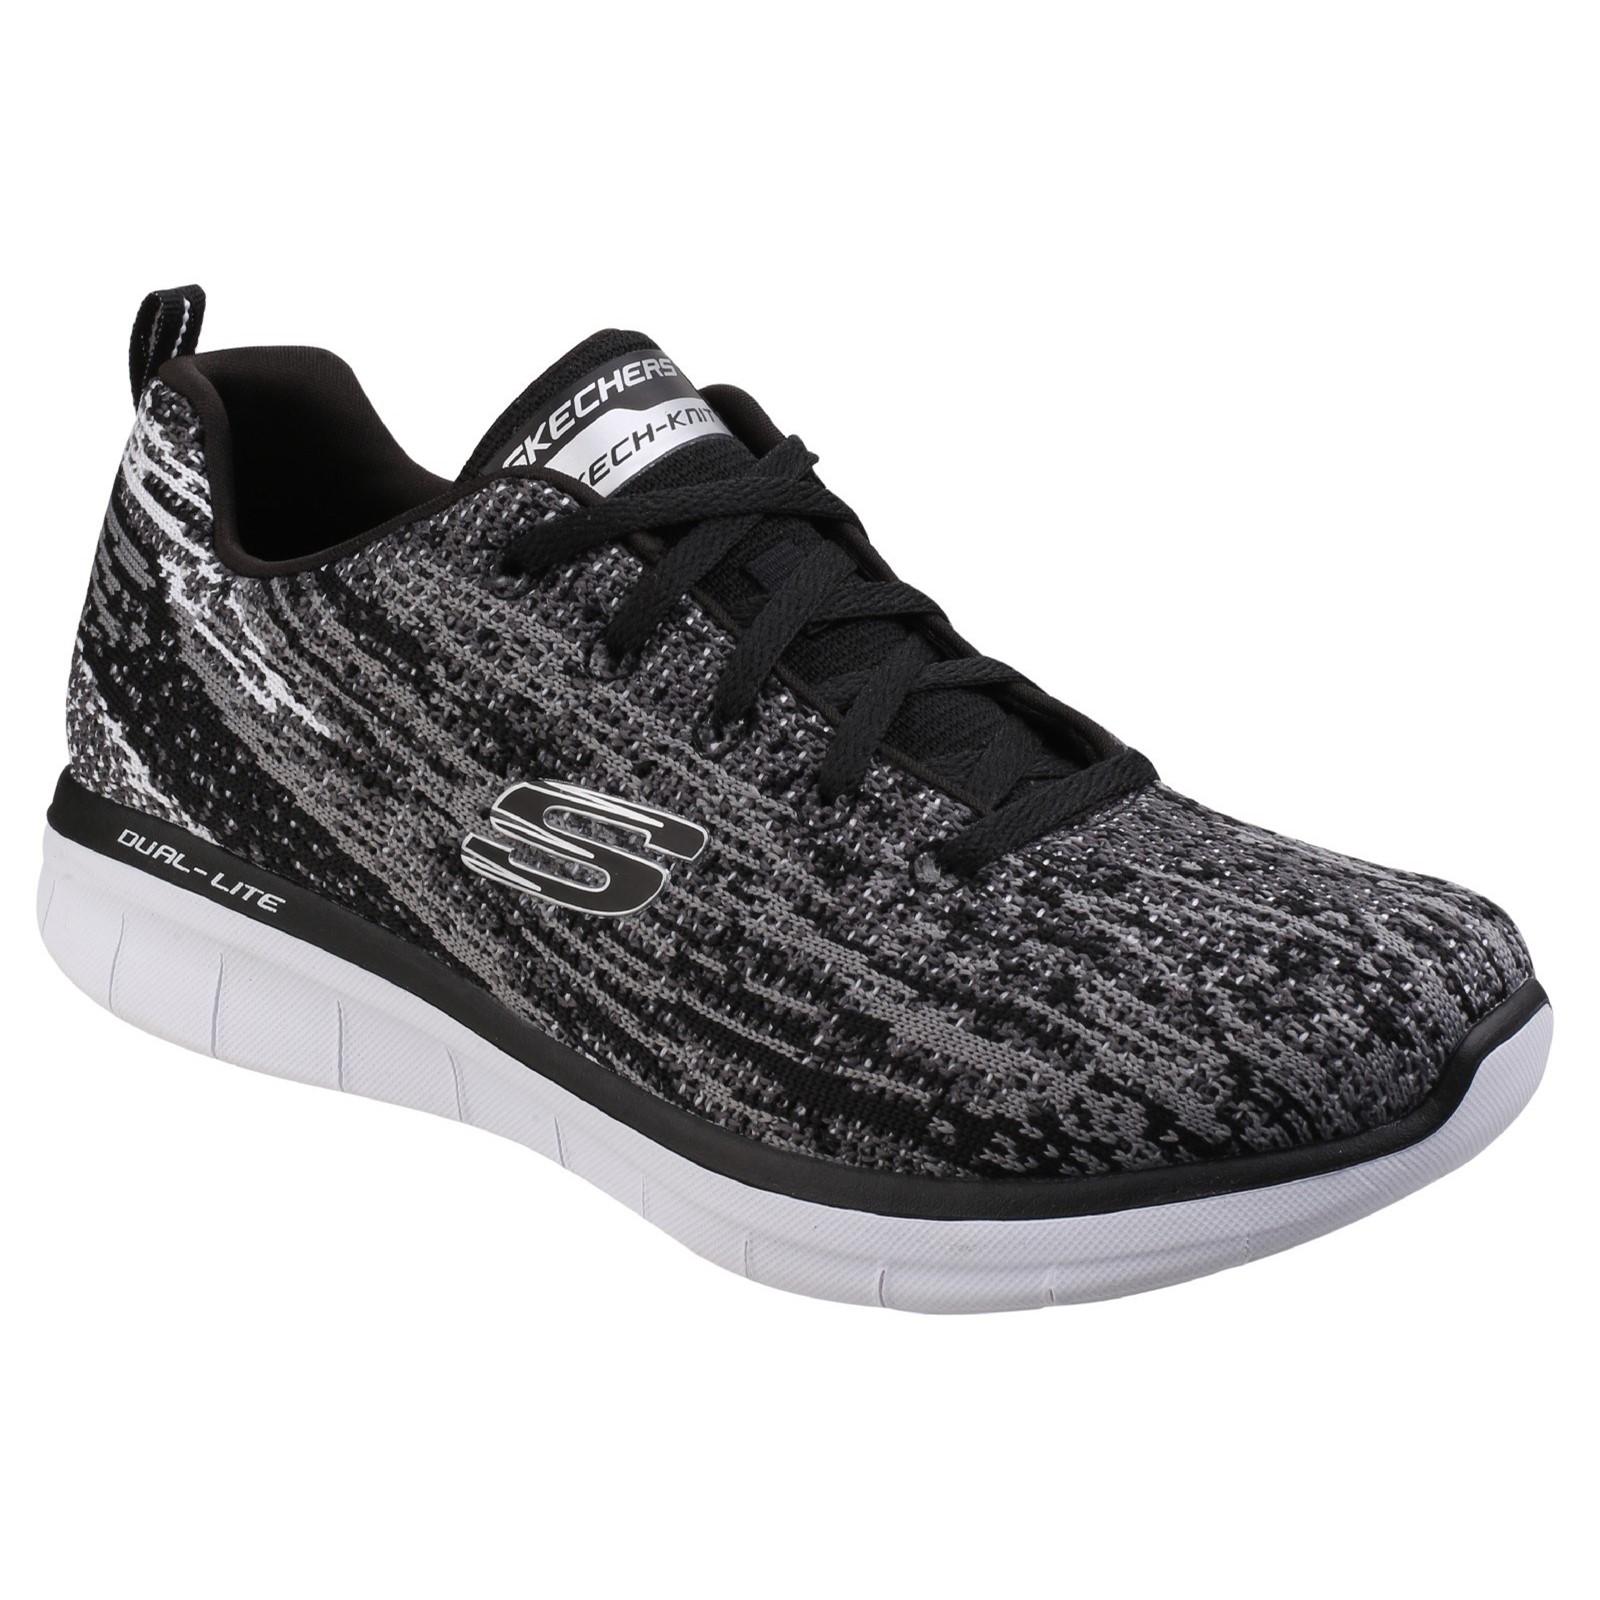 premium selection 2b33a bb2c4 ... Nike Roshe Run One Print Camo Camo Camo Men s Trainers Shoes Blue Navy  UK-8.5 ...